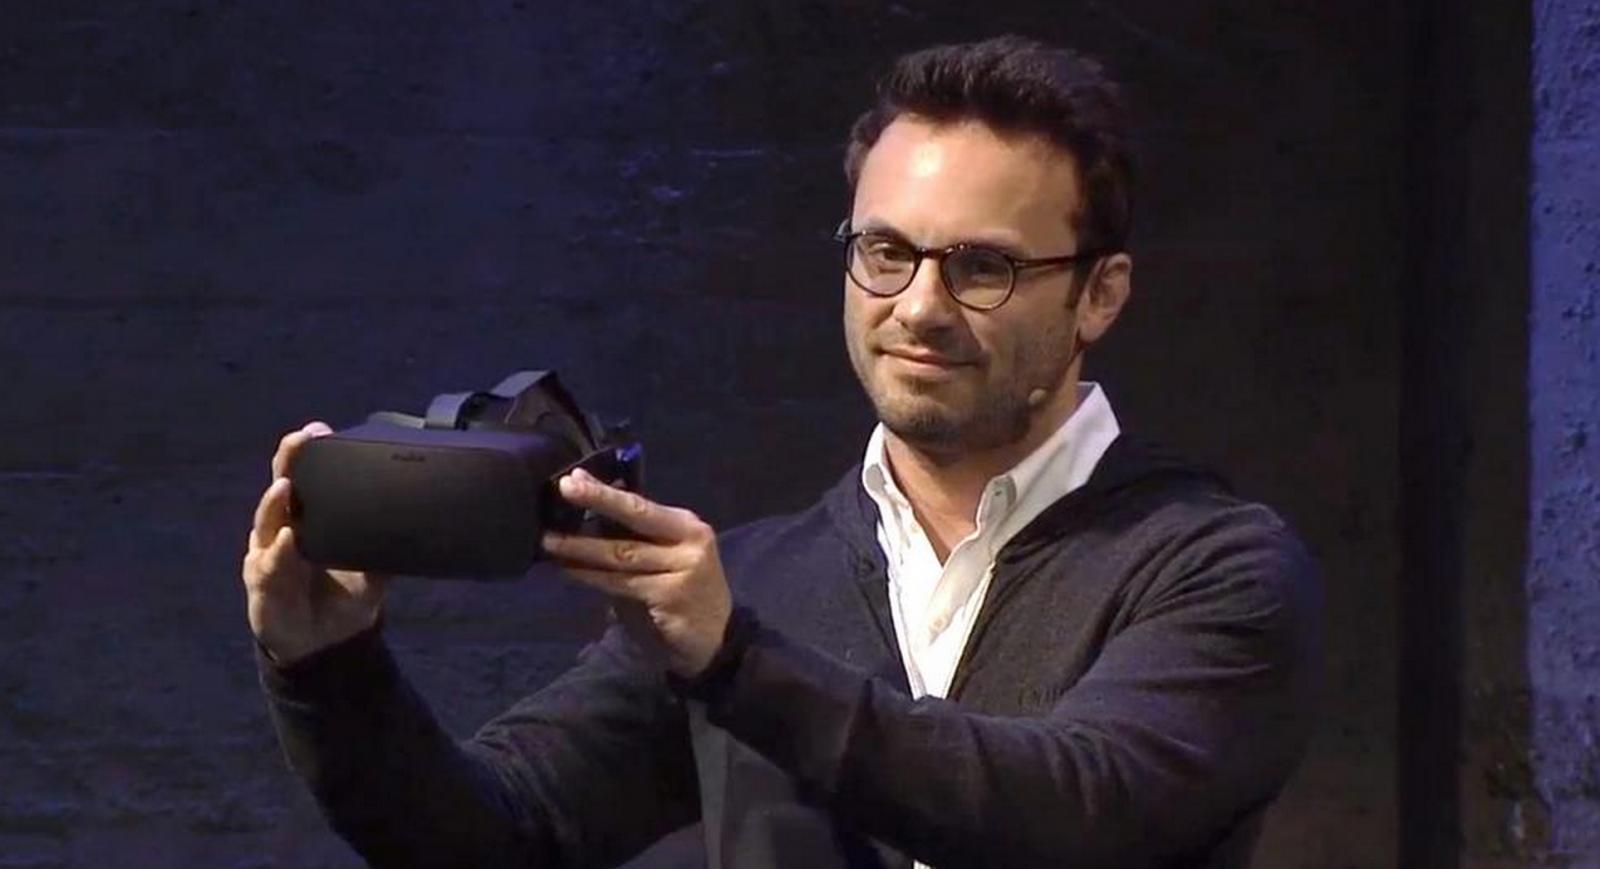 Oculus Rift consumer version release date